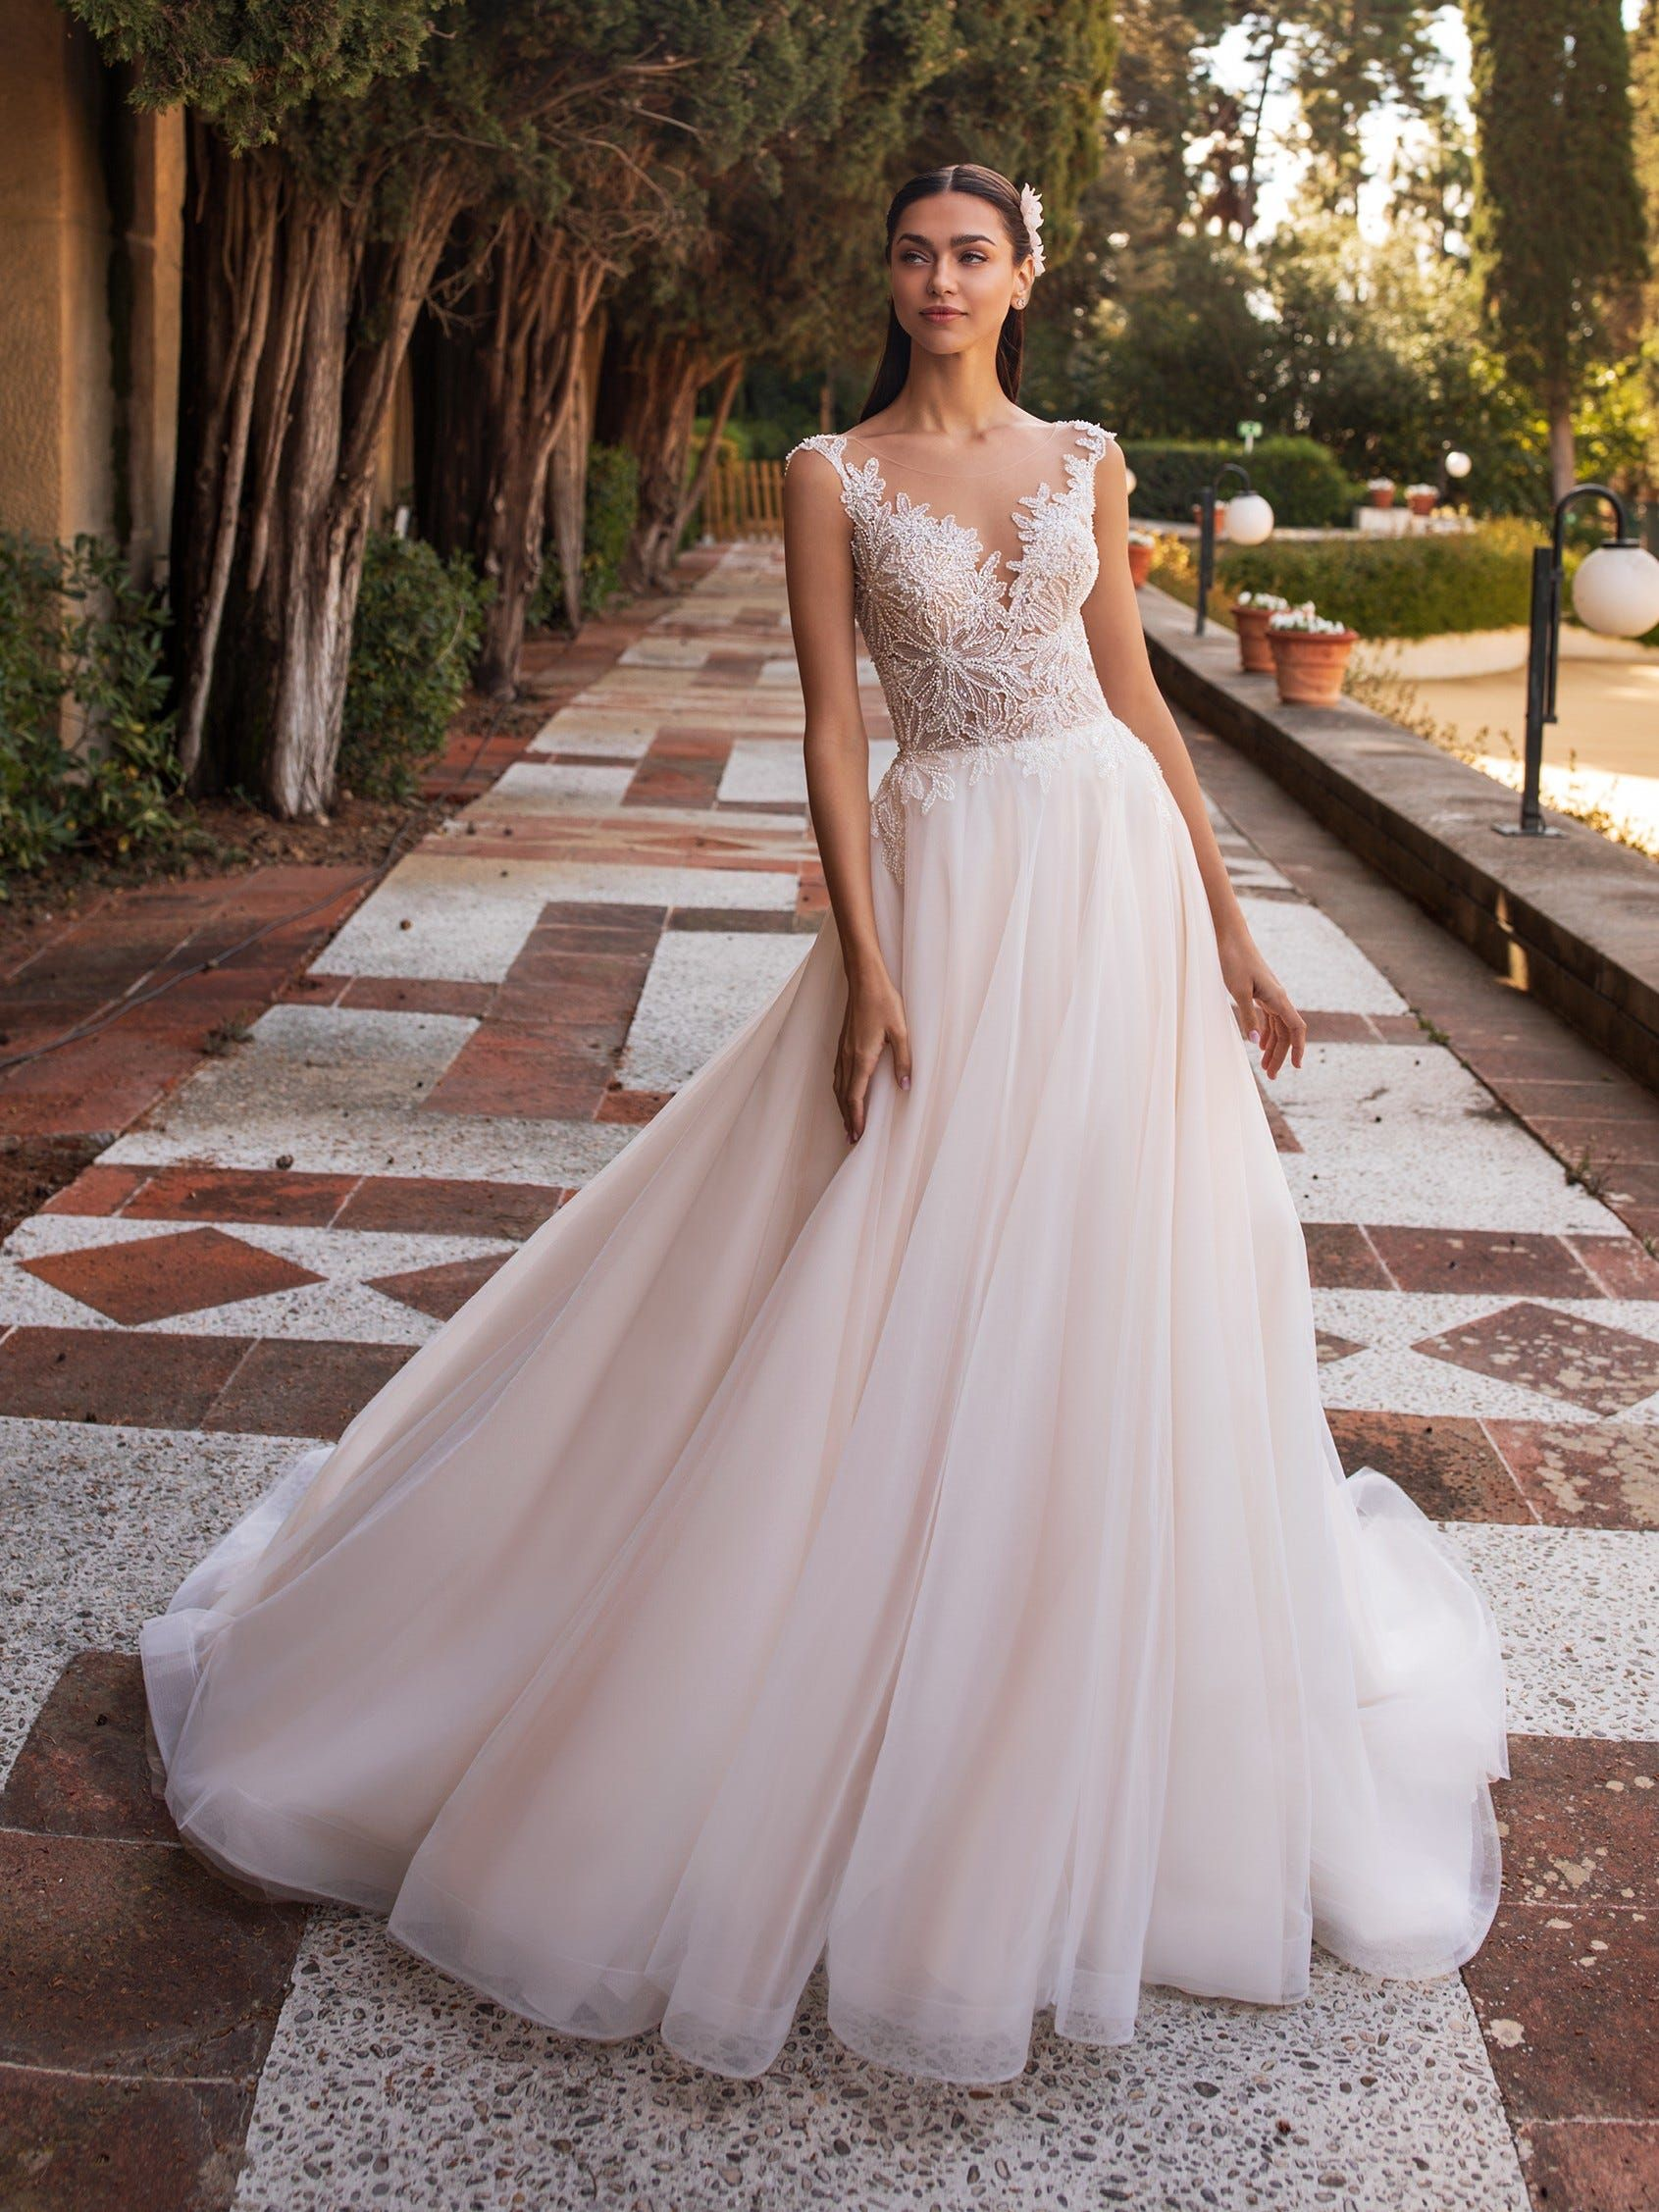 Io Pronovias Wedding Dress Pink Wedding Dresses Romantic Wedding Gown [ 2255 x 1691 Pixel ]